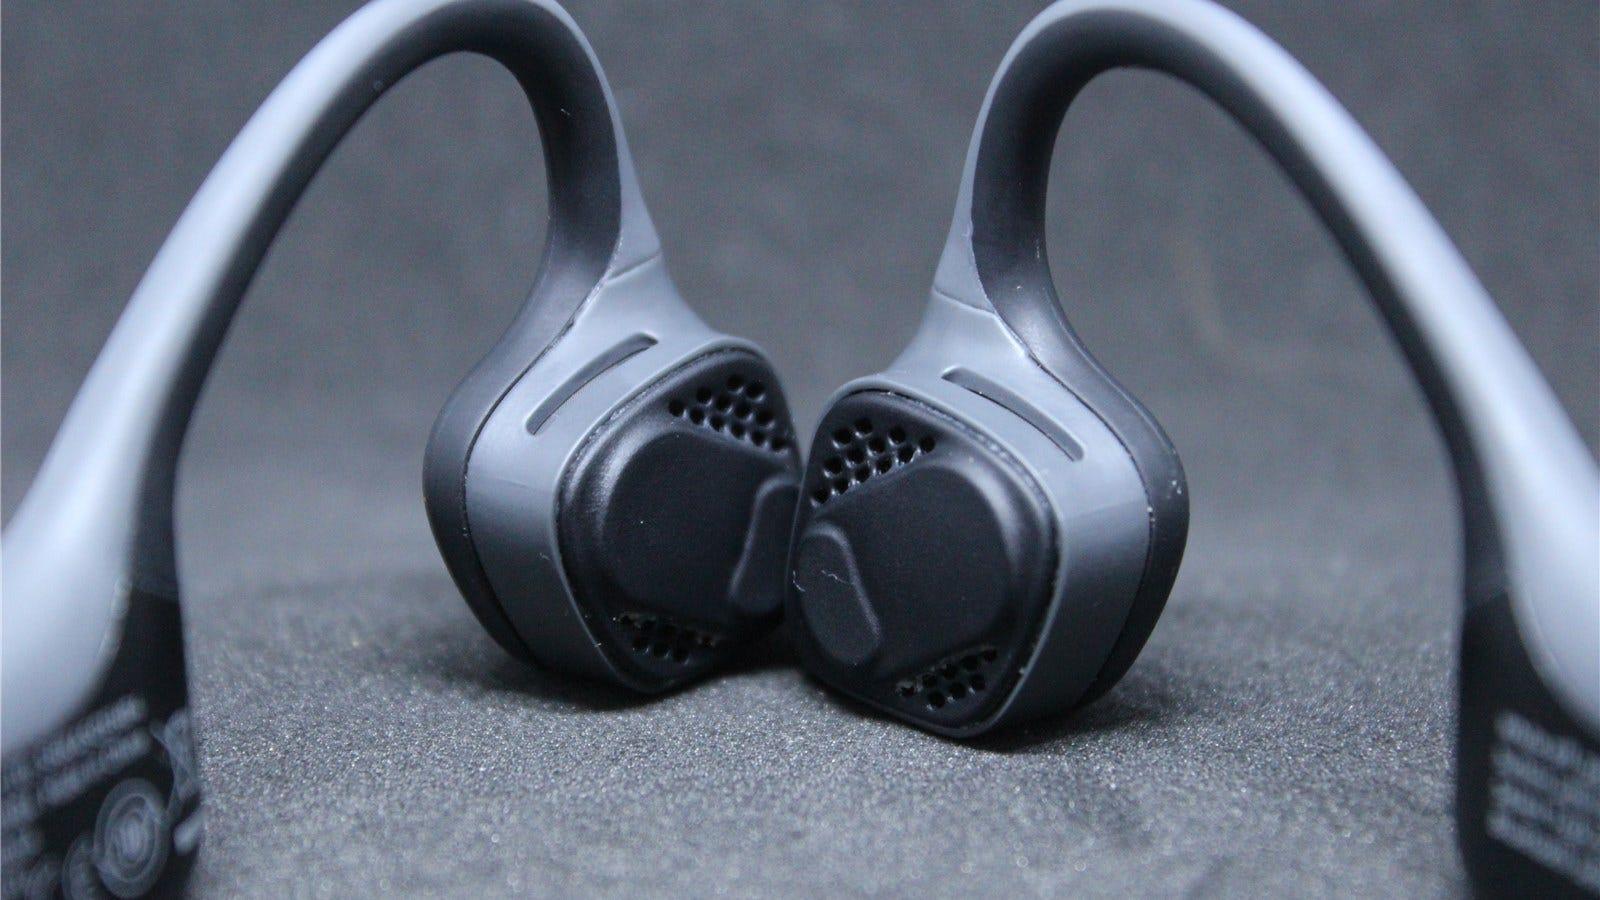 Aftershokz Trekz Air headphone speakers and pads.